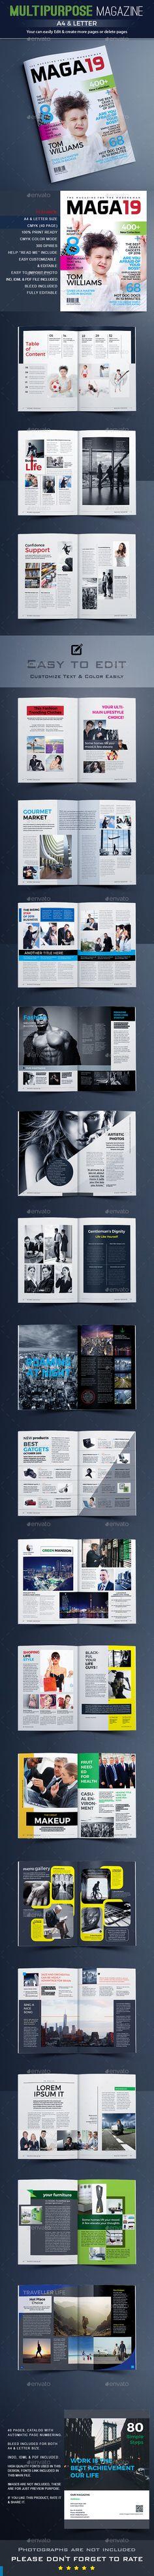 Multipurpose Magazine Template - Magazines Print Templates Download here : https://graphicriver.net/item/multipurpose-magazine-template/19603365?s_rank=27&ref=Al-fatih